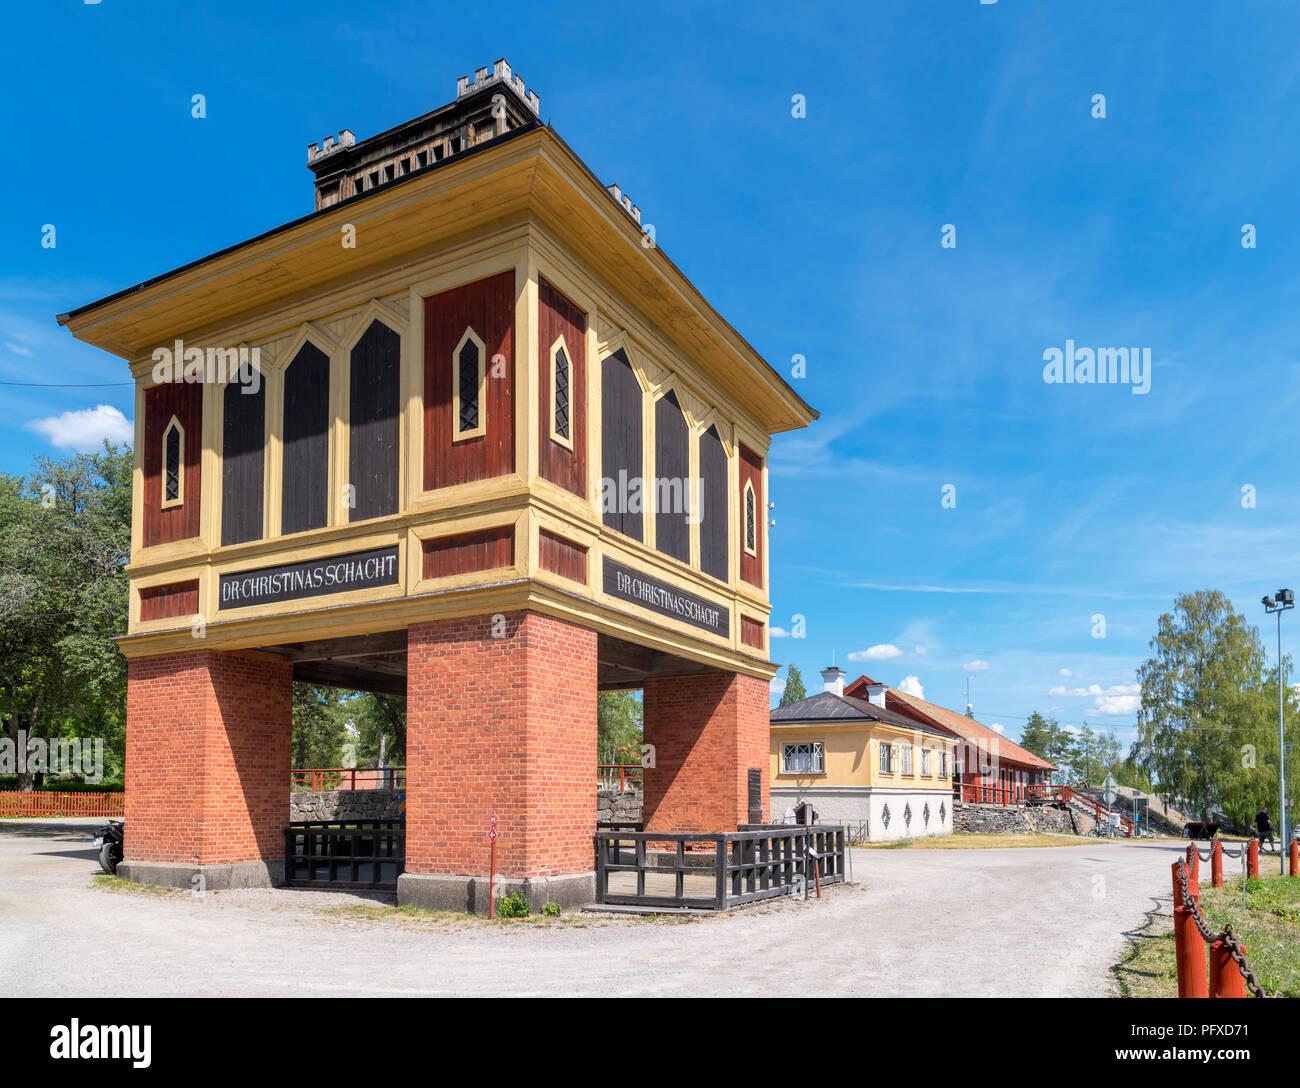 The Queen Christina shaft at Sala Silver  Mine (Sala silvergruva), an open air museum in Sala, Västmanland, Sweden - Stock Image